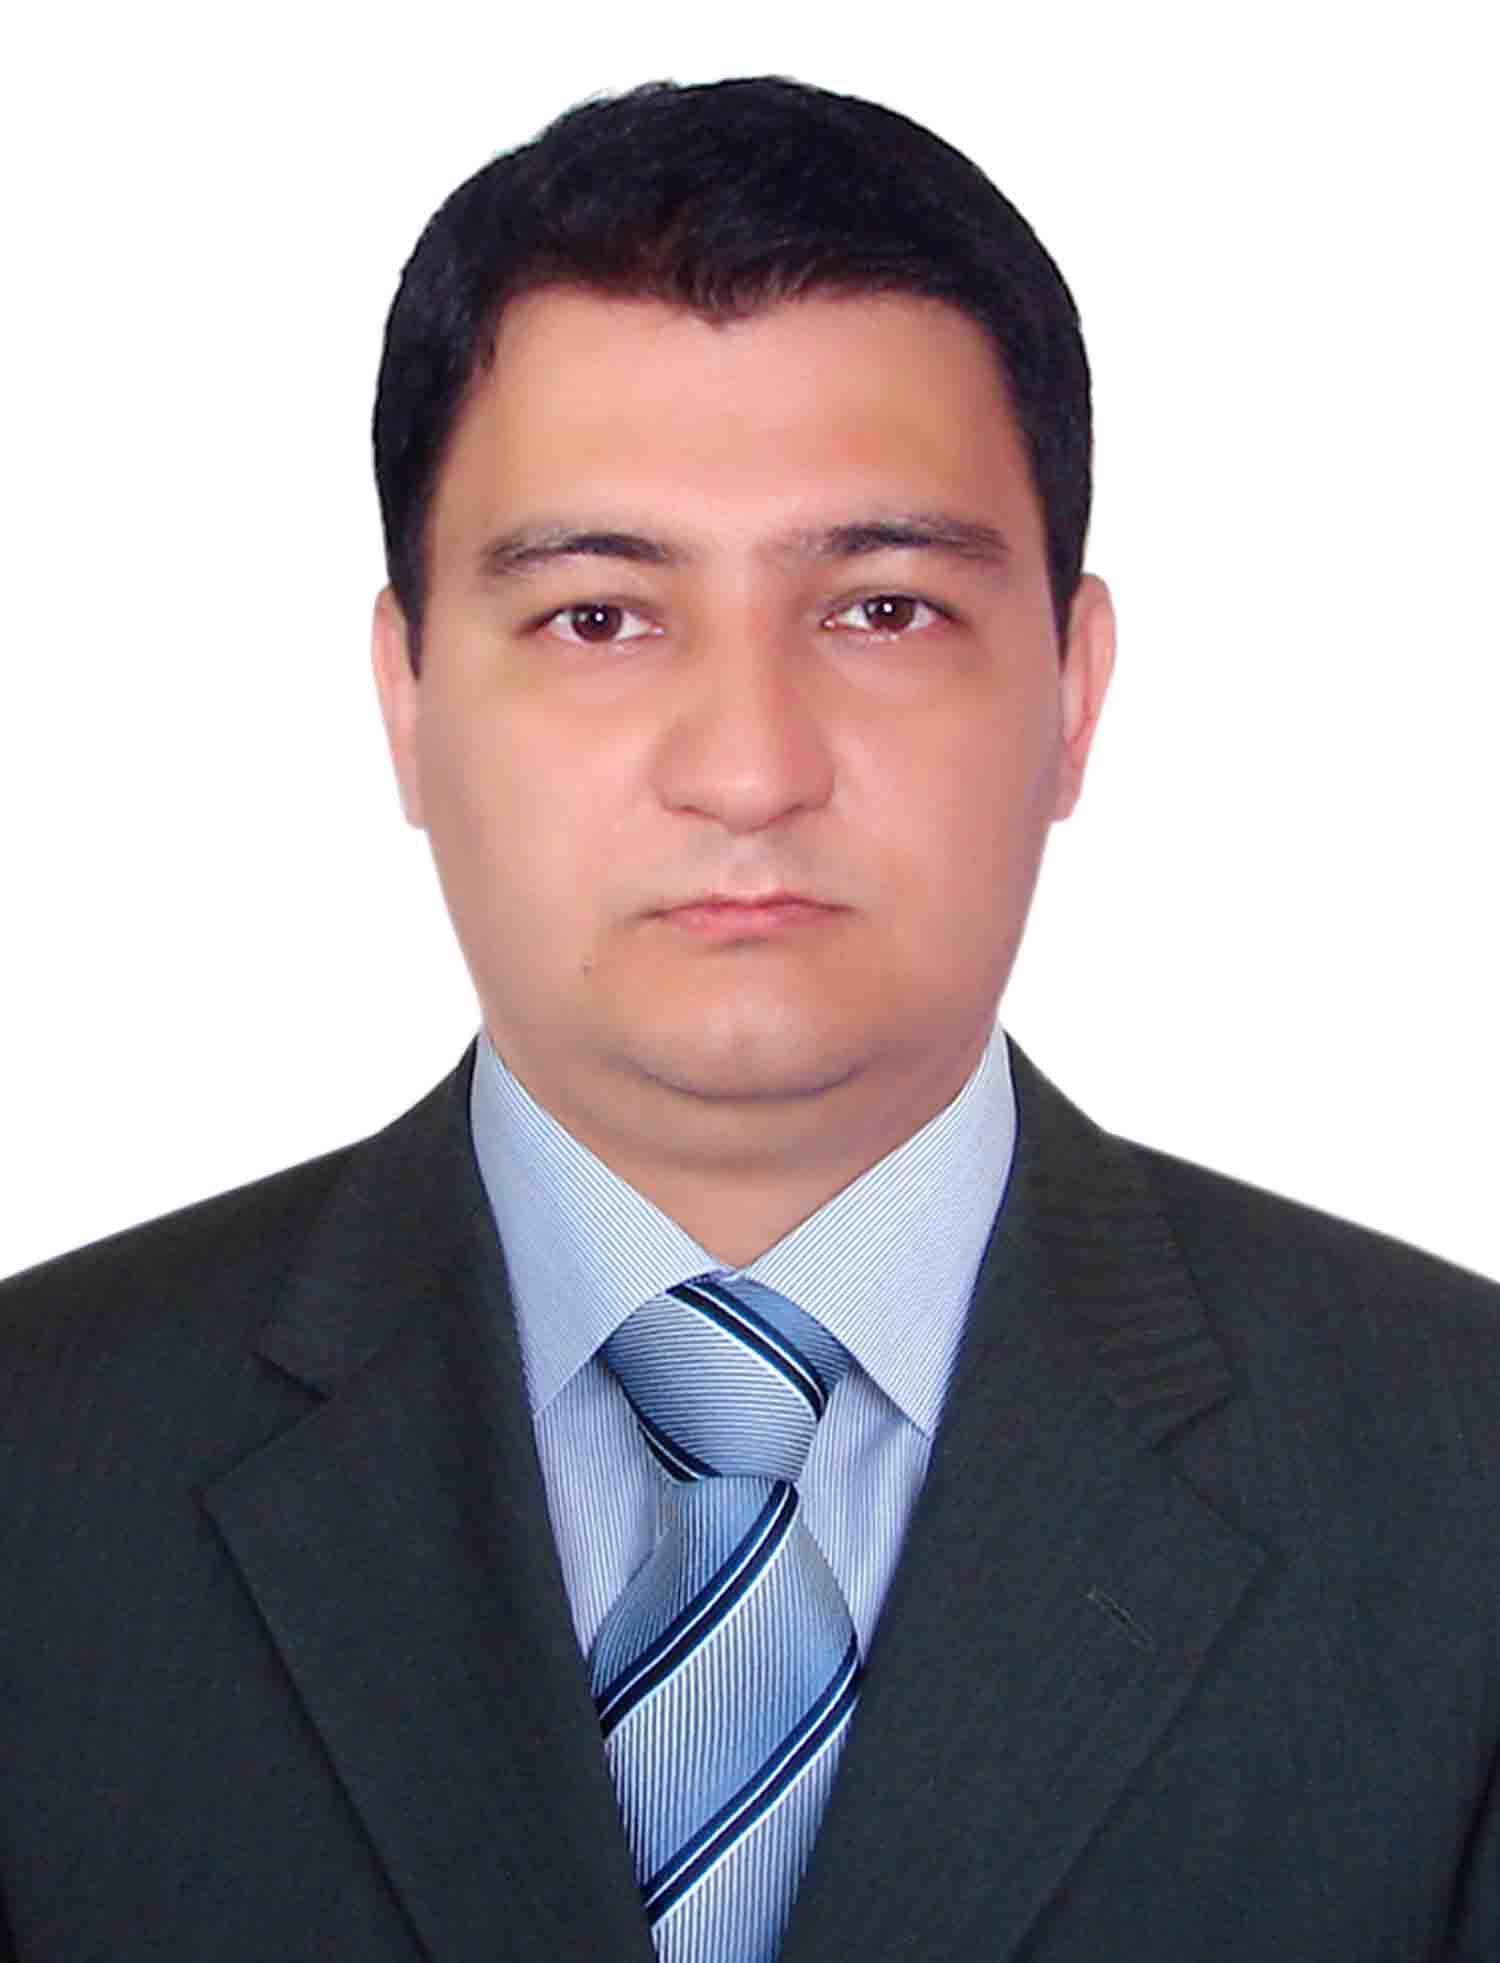 Зуфар Ашуров